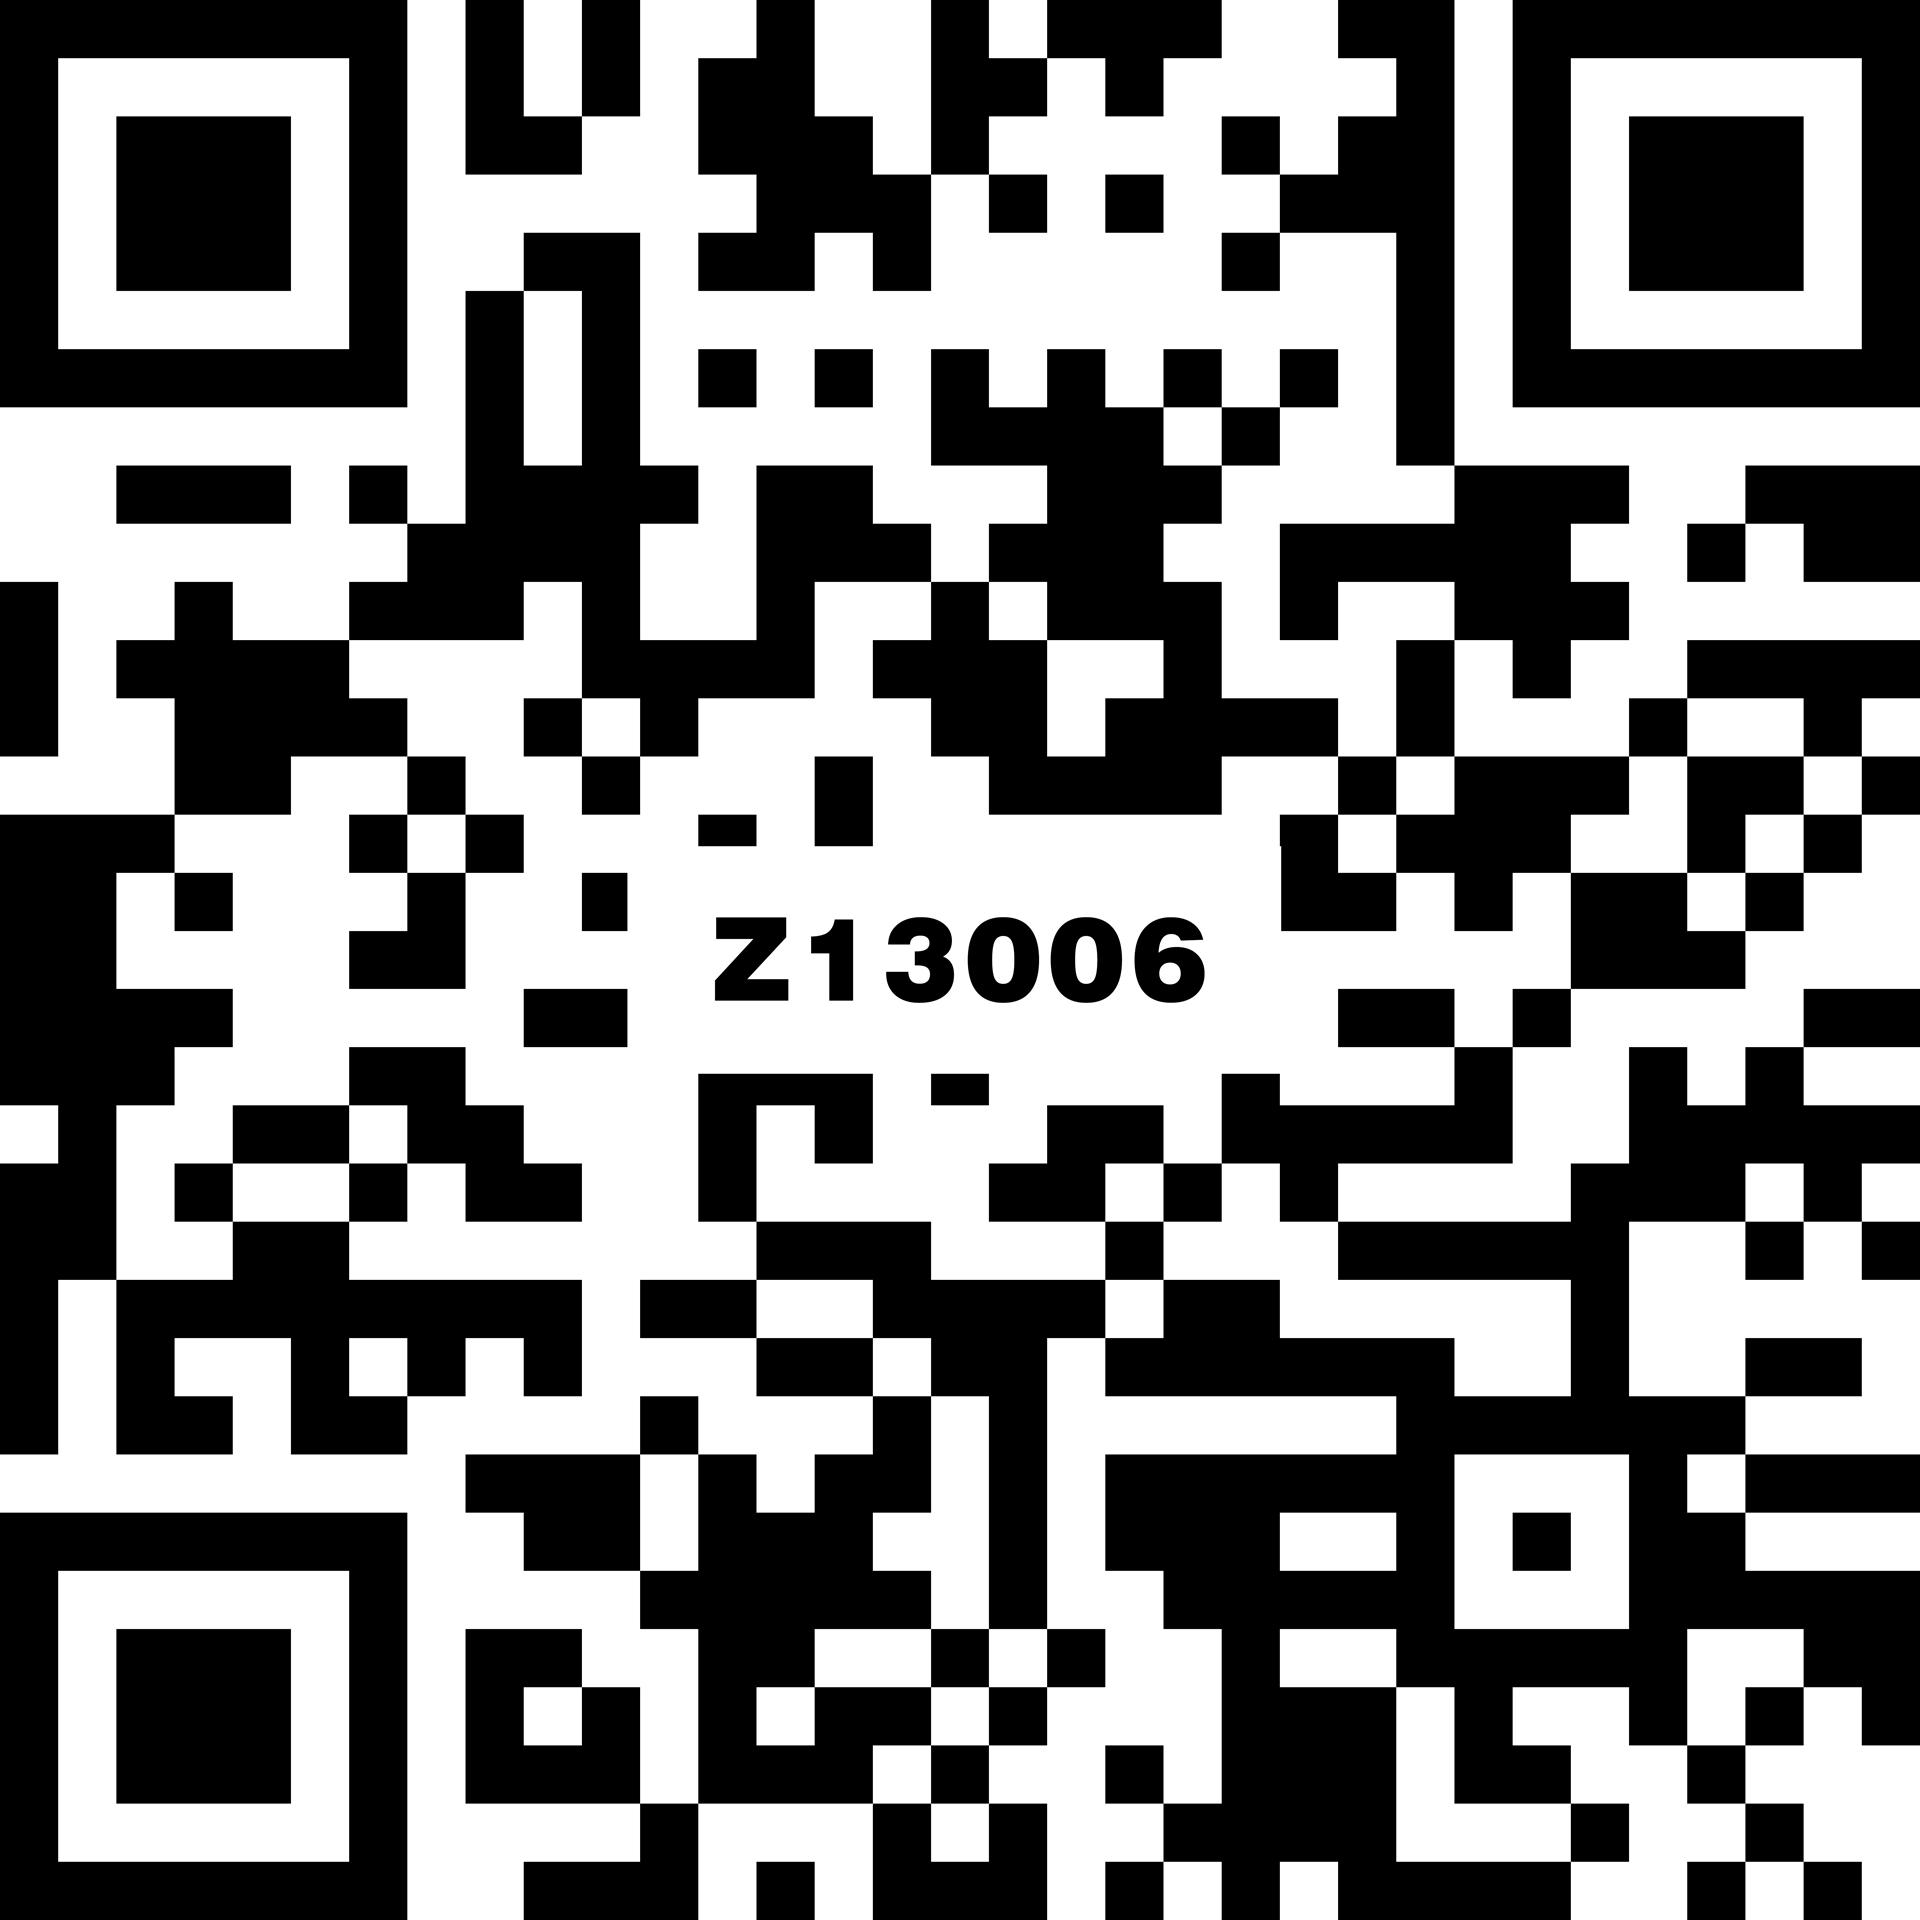 Z13006